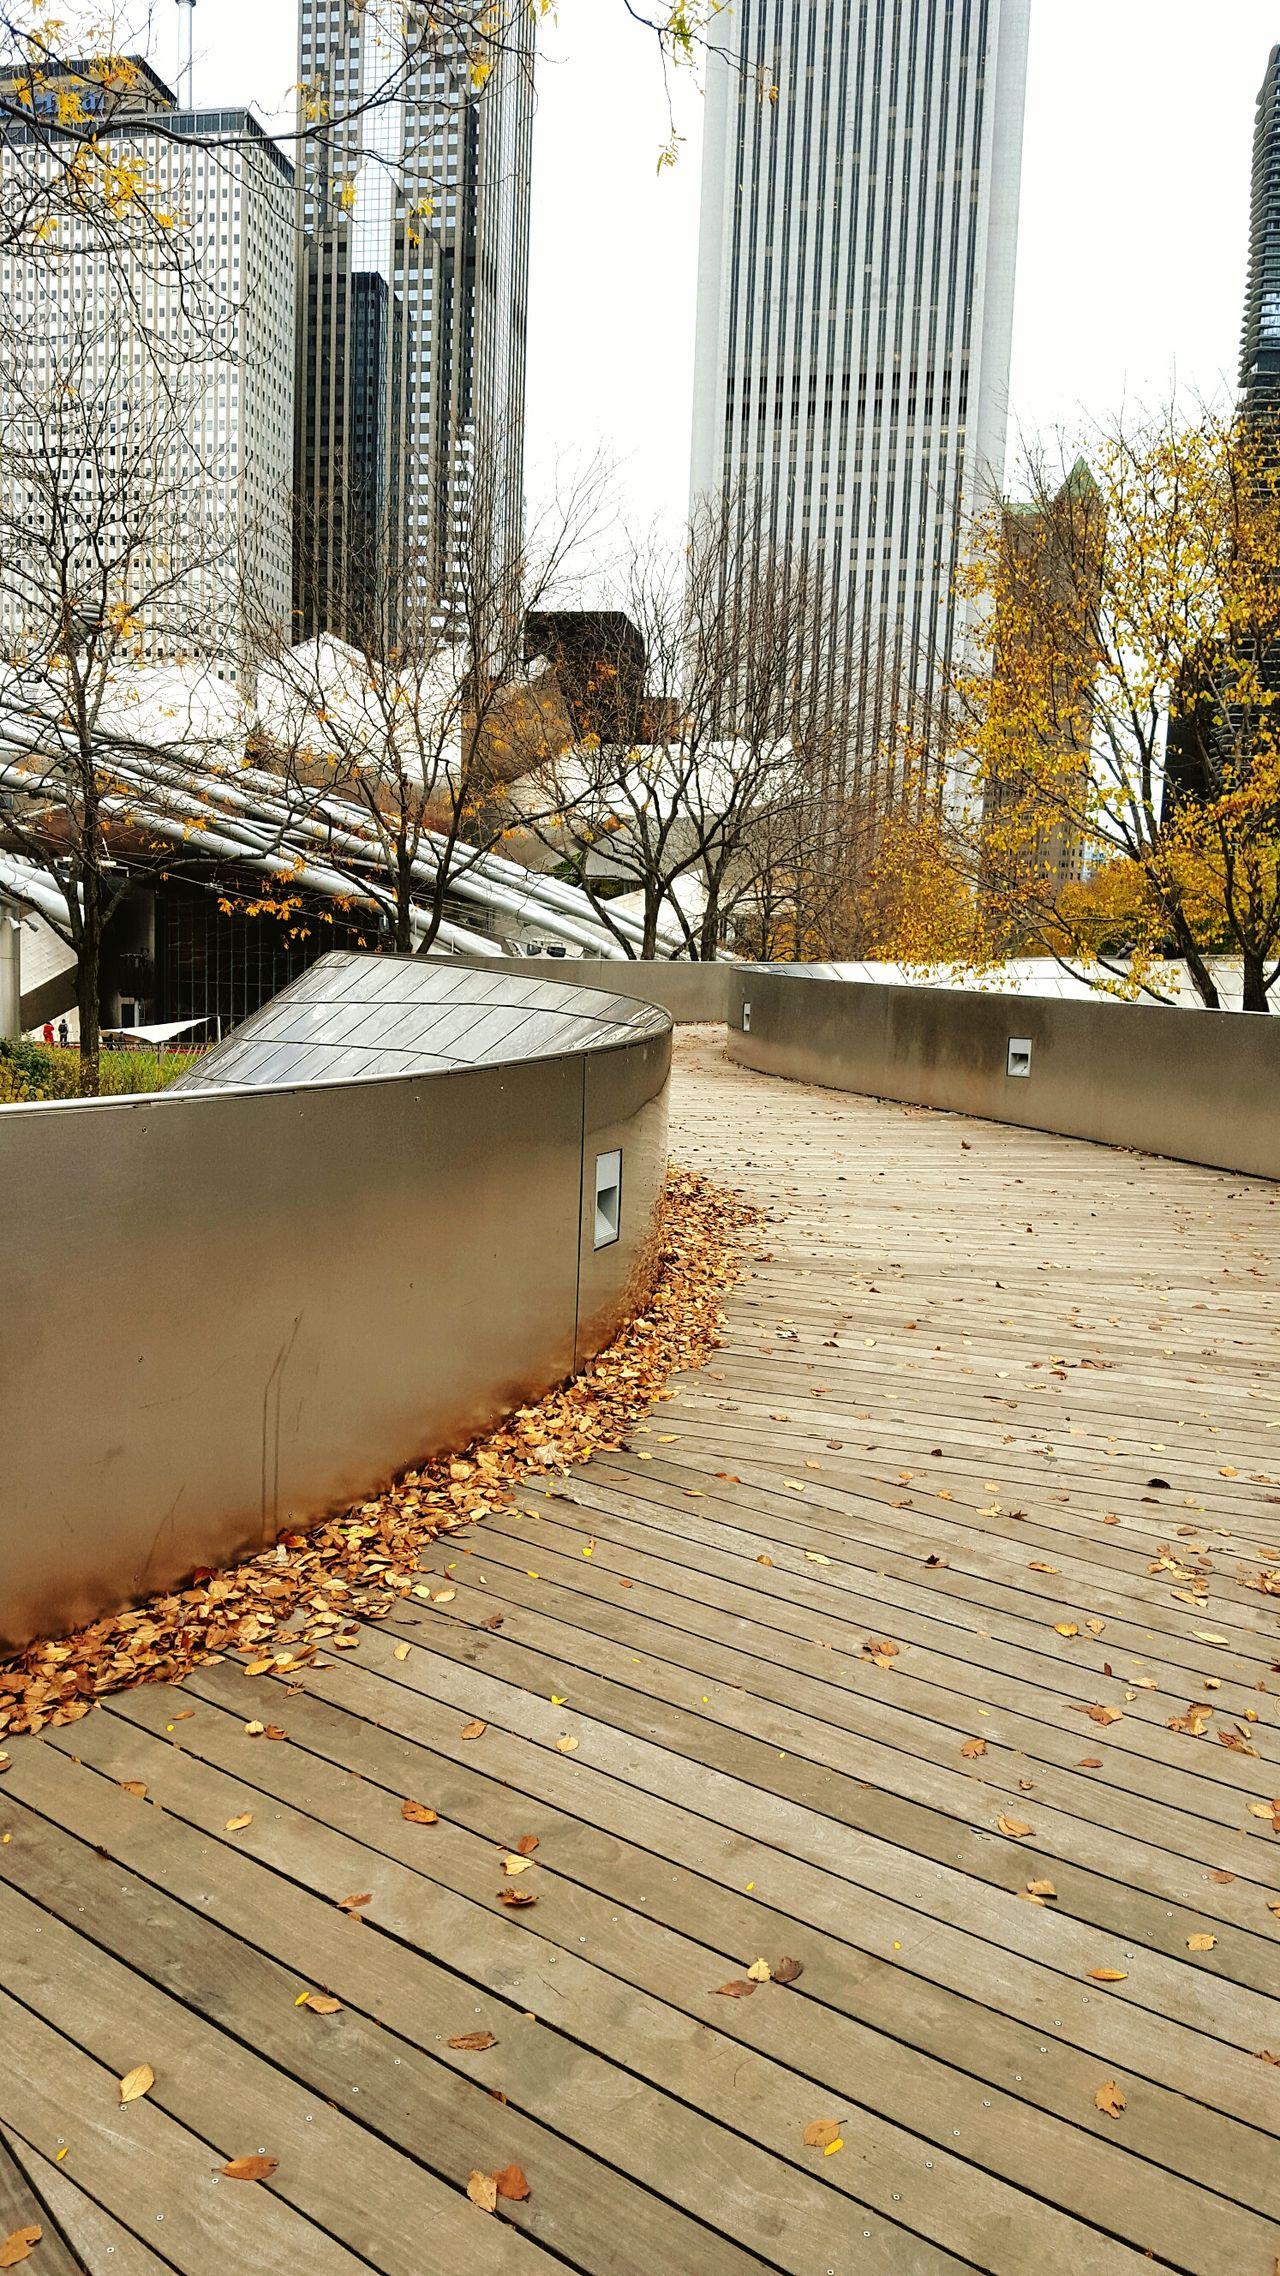 Taking Photos Chicago Bpbridge Millenniumpark Check This Out Hello World